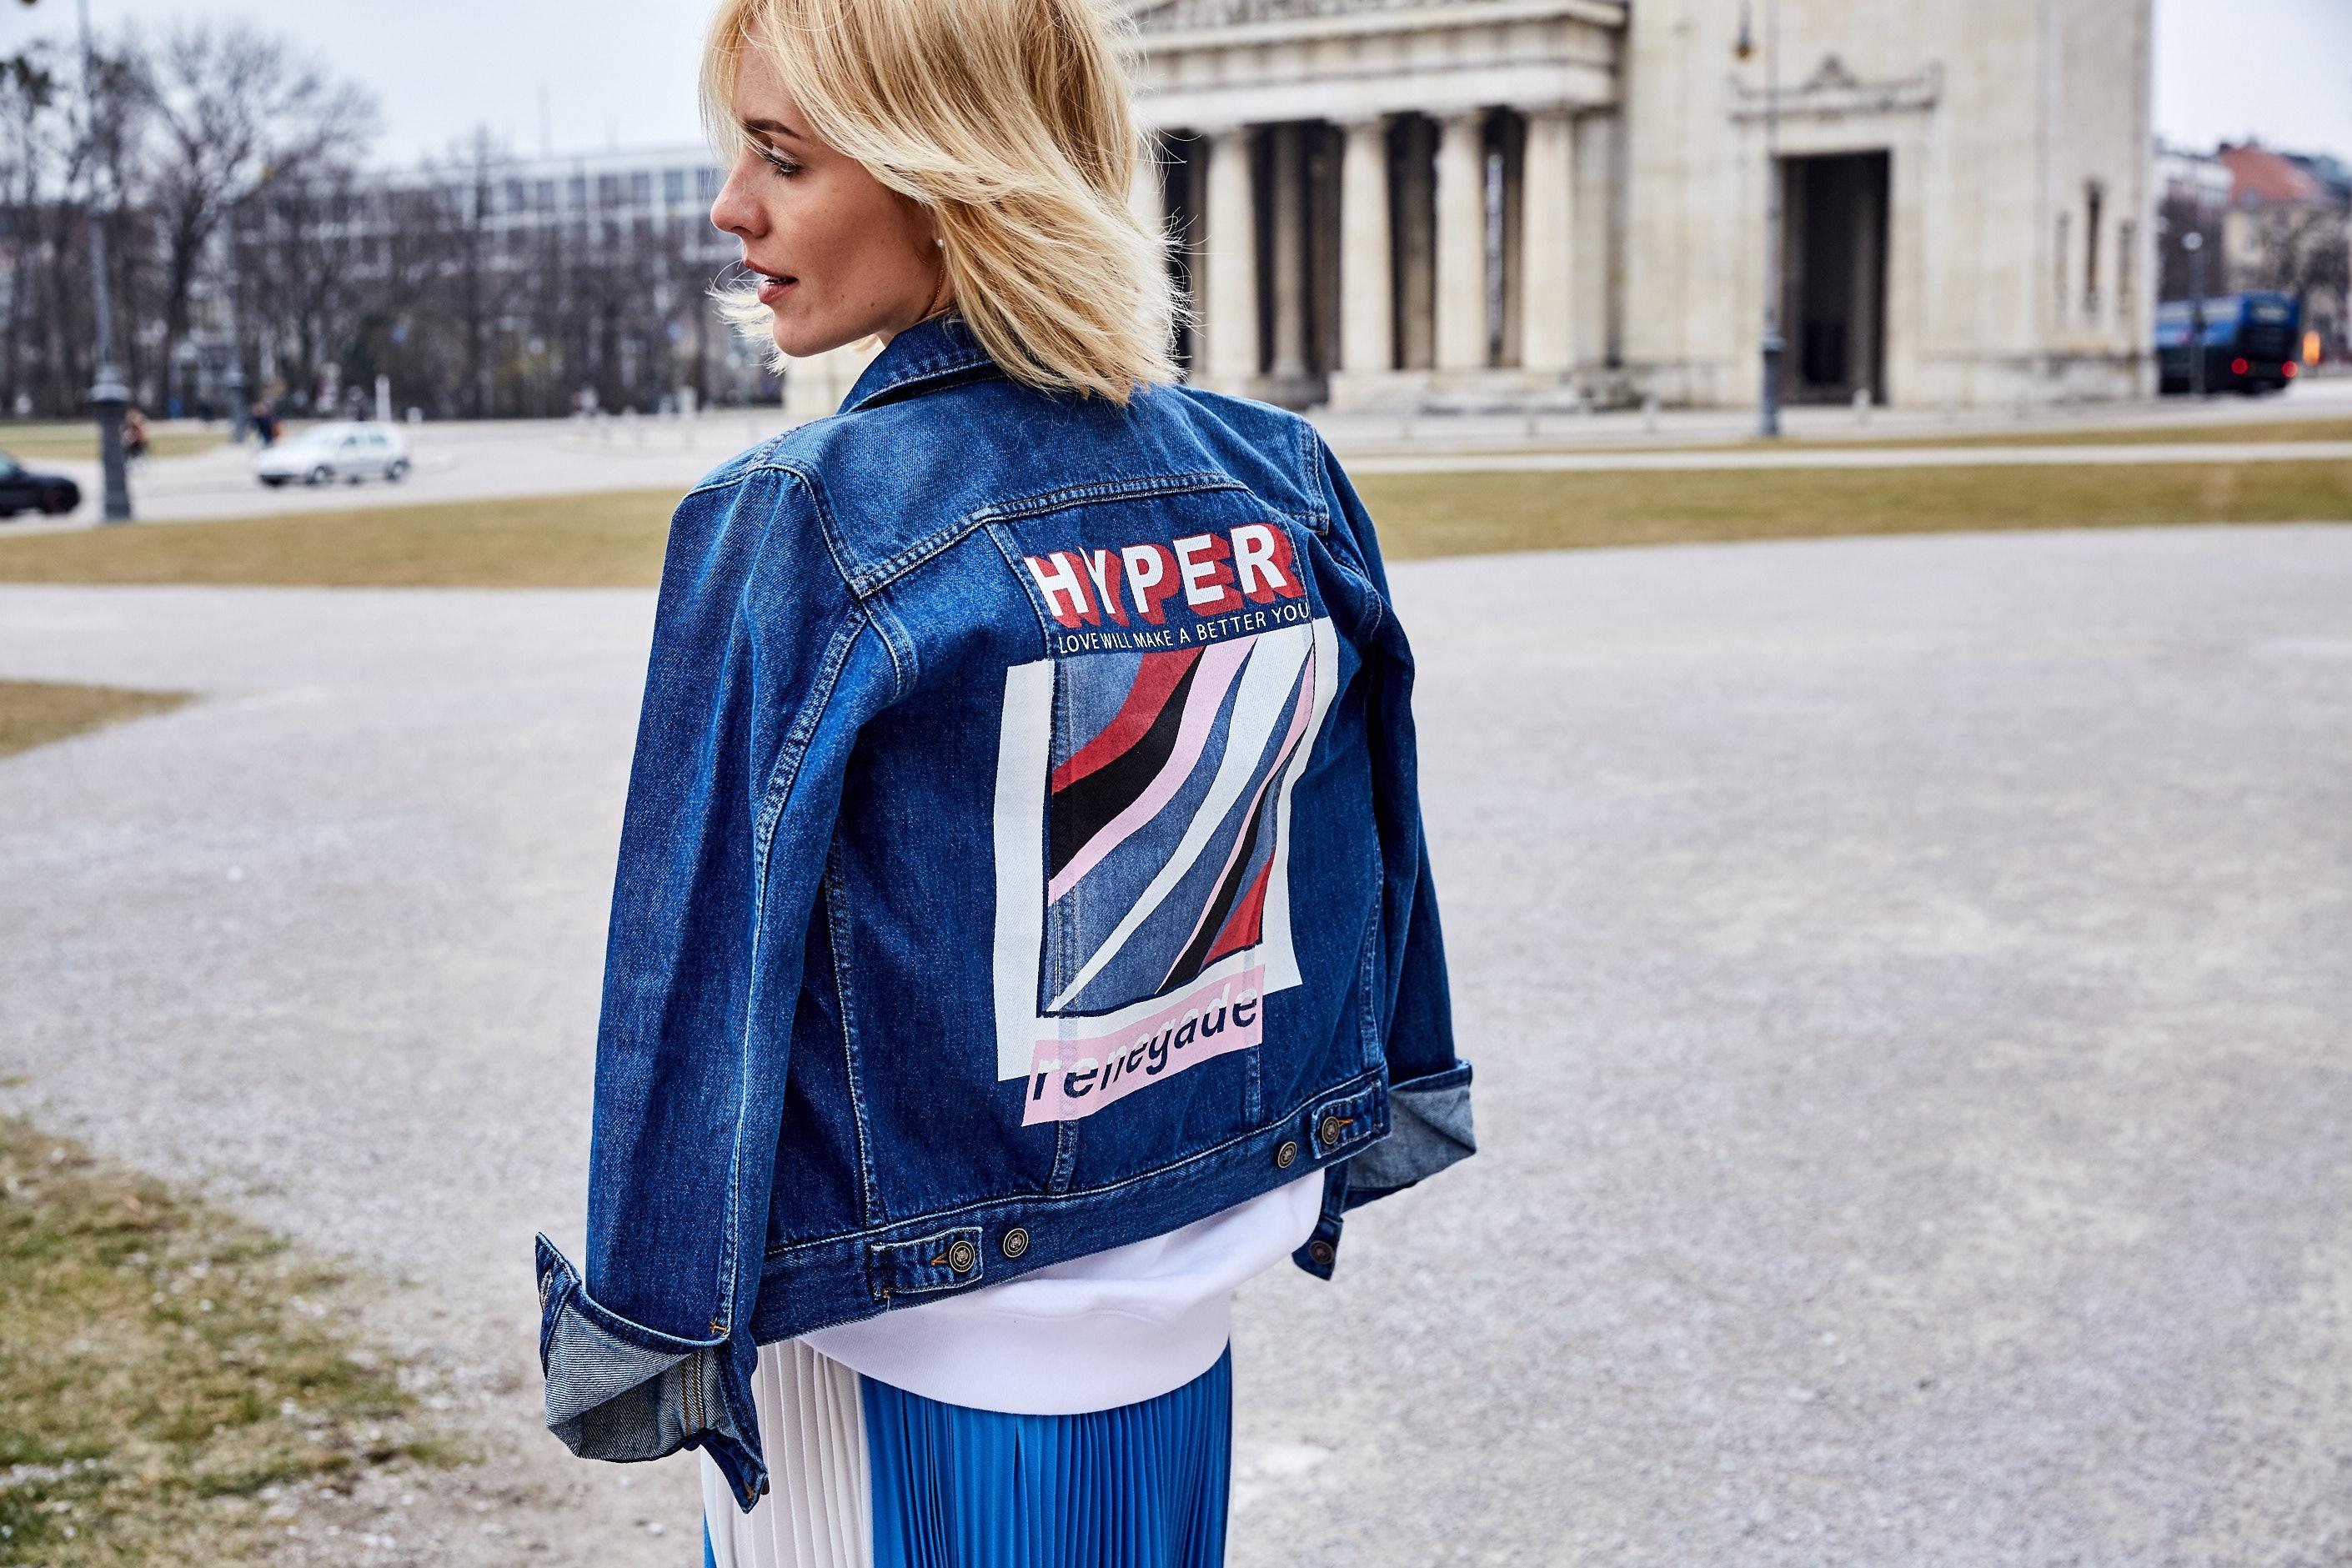 Glam-o-meter, Viktoria Rader, Spring Looks, Denim Jacket, Lodenfrey, Munich